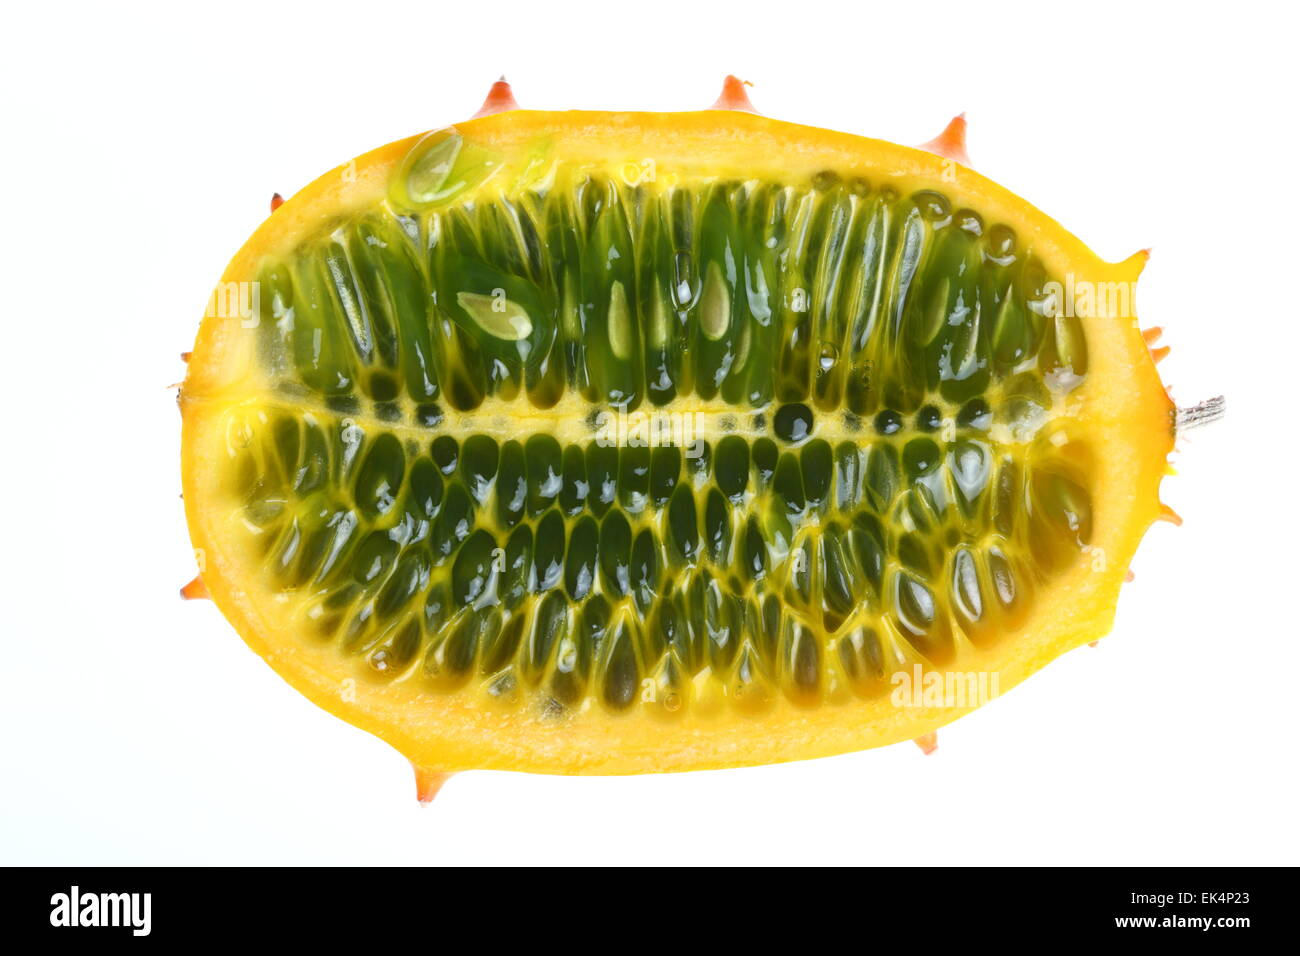 Kiwano, Horned melon fruit, cucumber Horn, Horn melon, Cucumis metuliferus - Stock Image